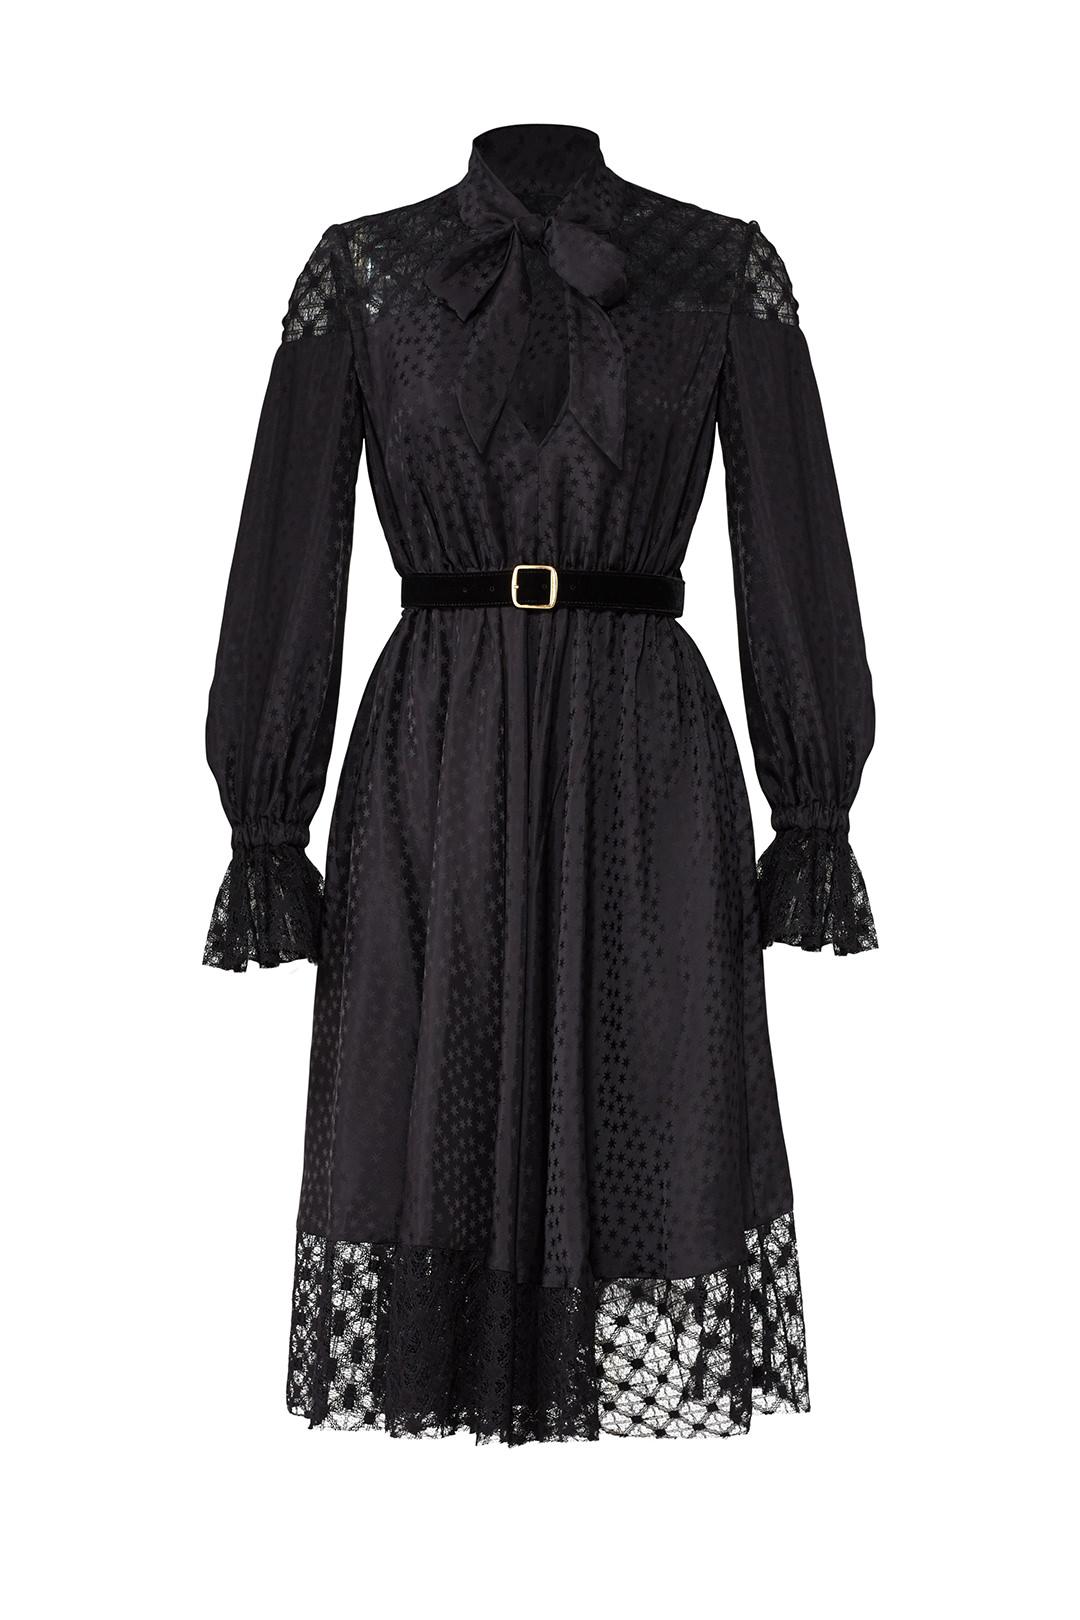 Black Lace Tie Philosophy di Lorenzo Serafini dress from Rent the Runway